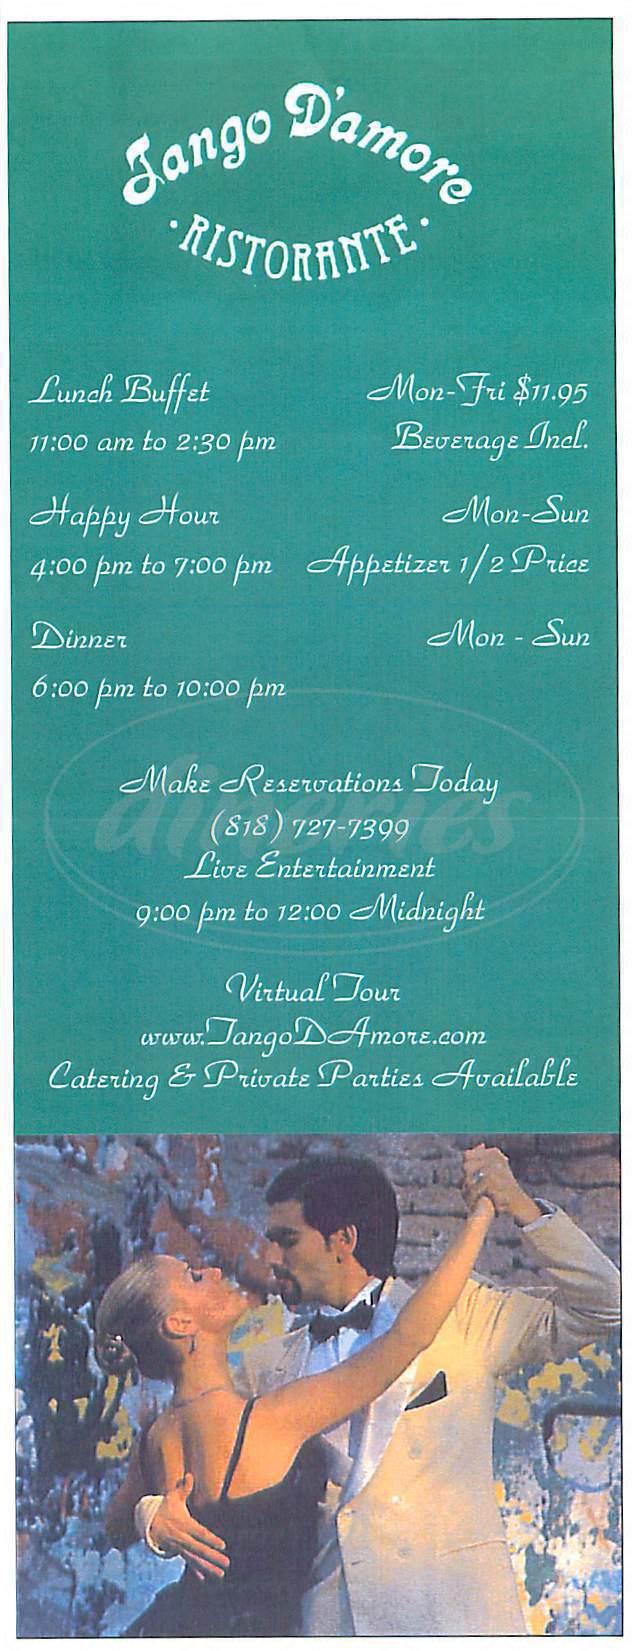 menu for Tango D'Amore Ristorante